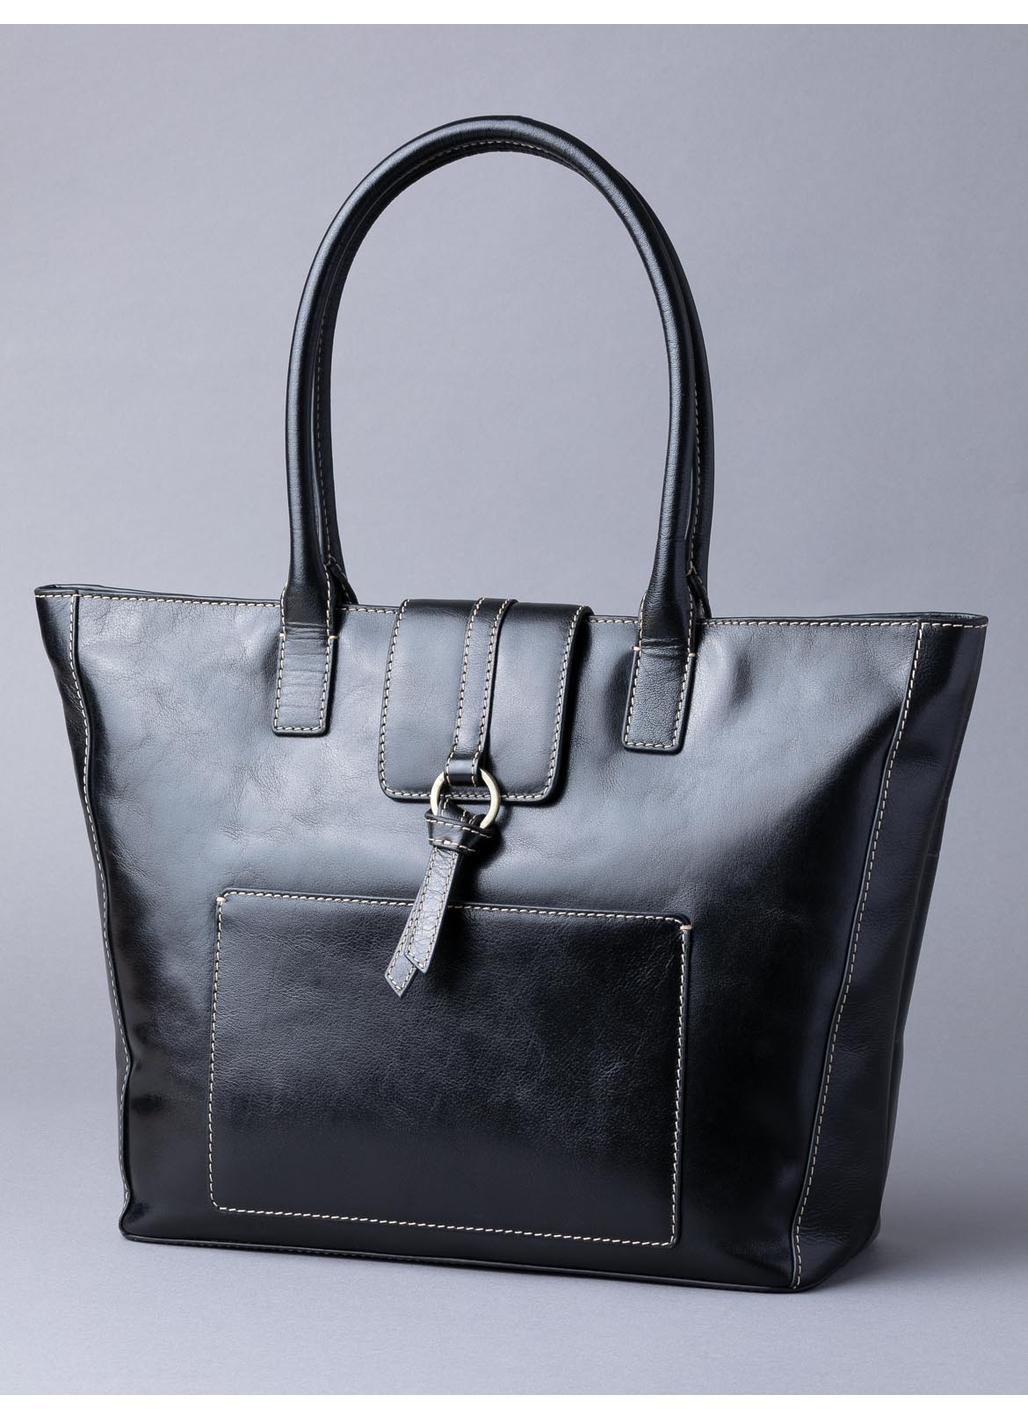 Birthwaite Leather Shopper Bag in Black